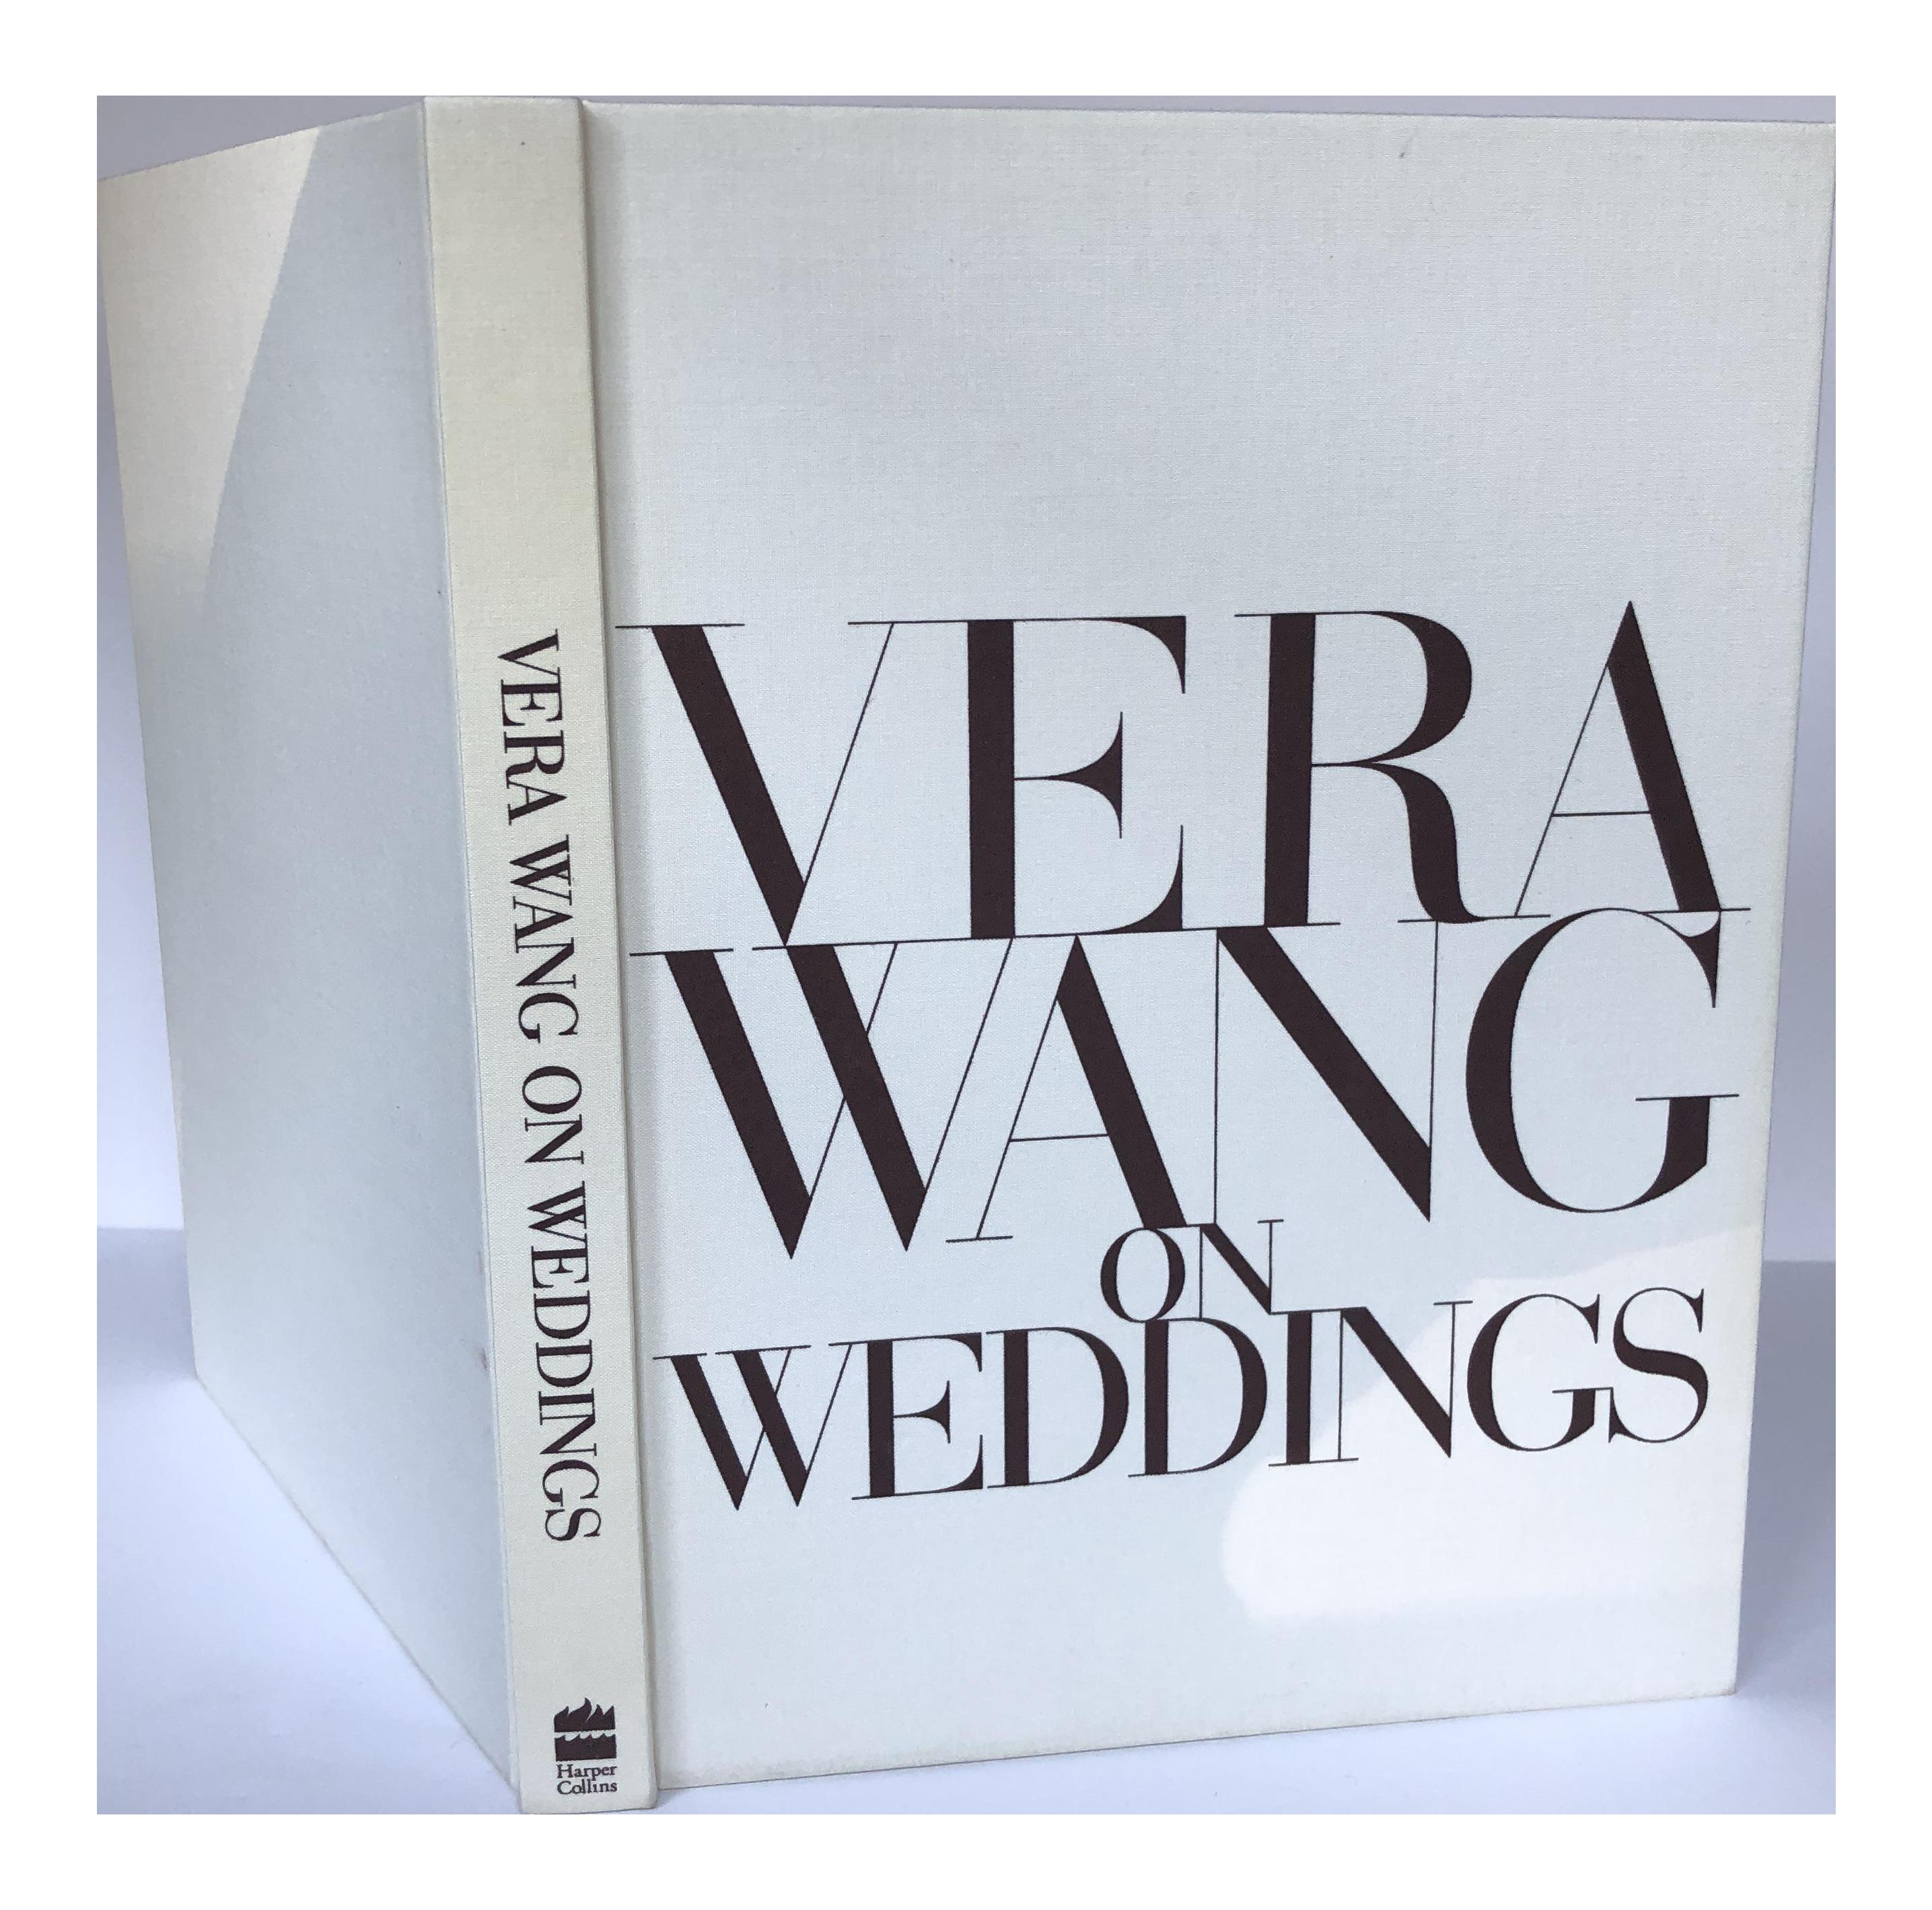 Vera Wang On Weddings - Coffee Table Book | Chairish